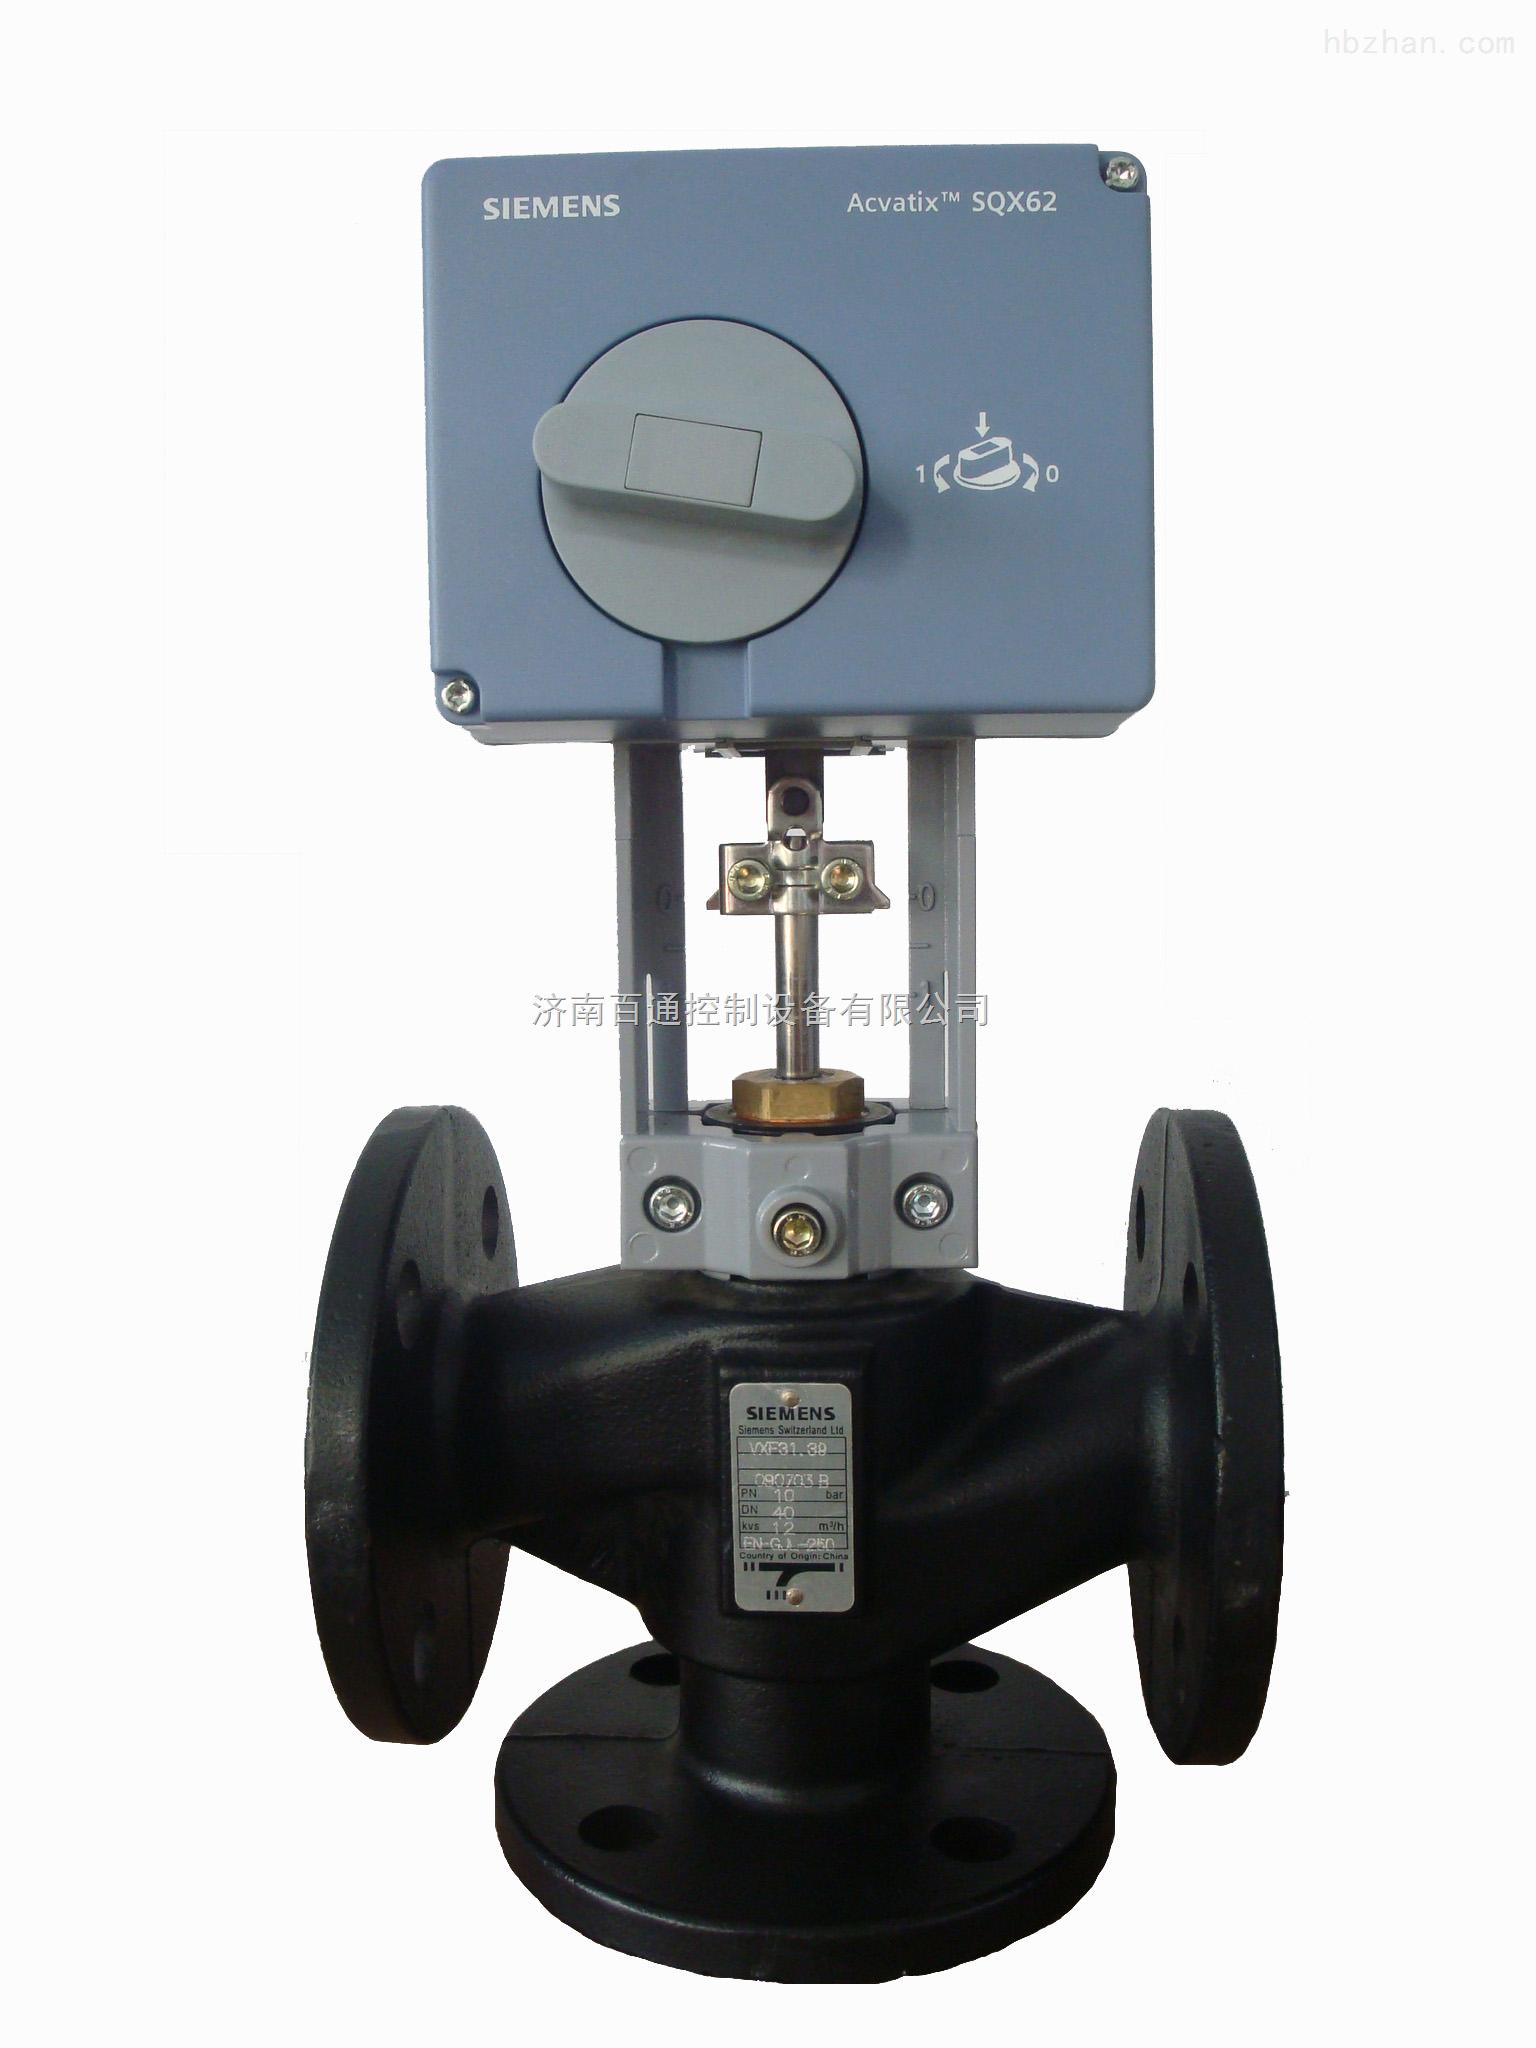 dn15--250 西门子电动调节阀 西门子电动温控阀 西门子温控阀图片